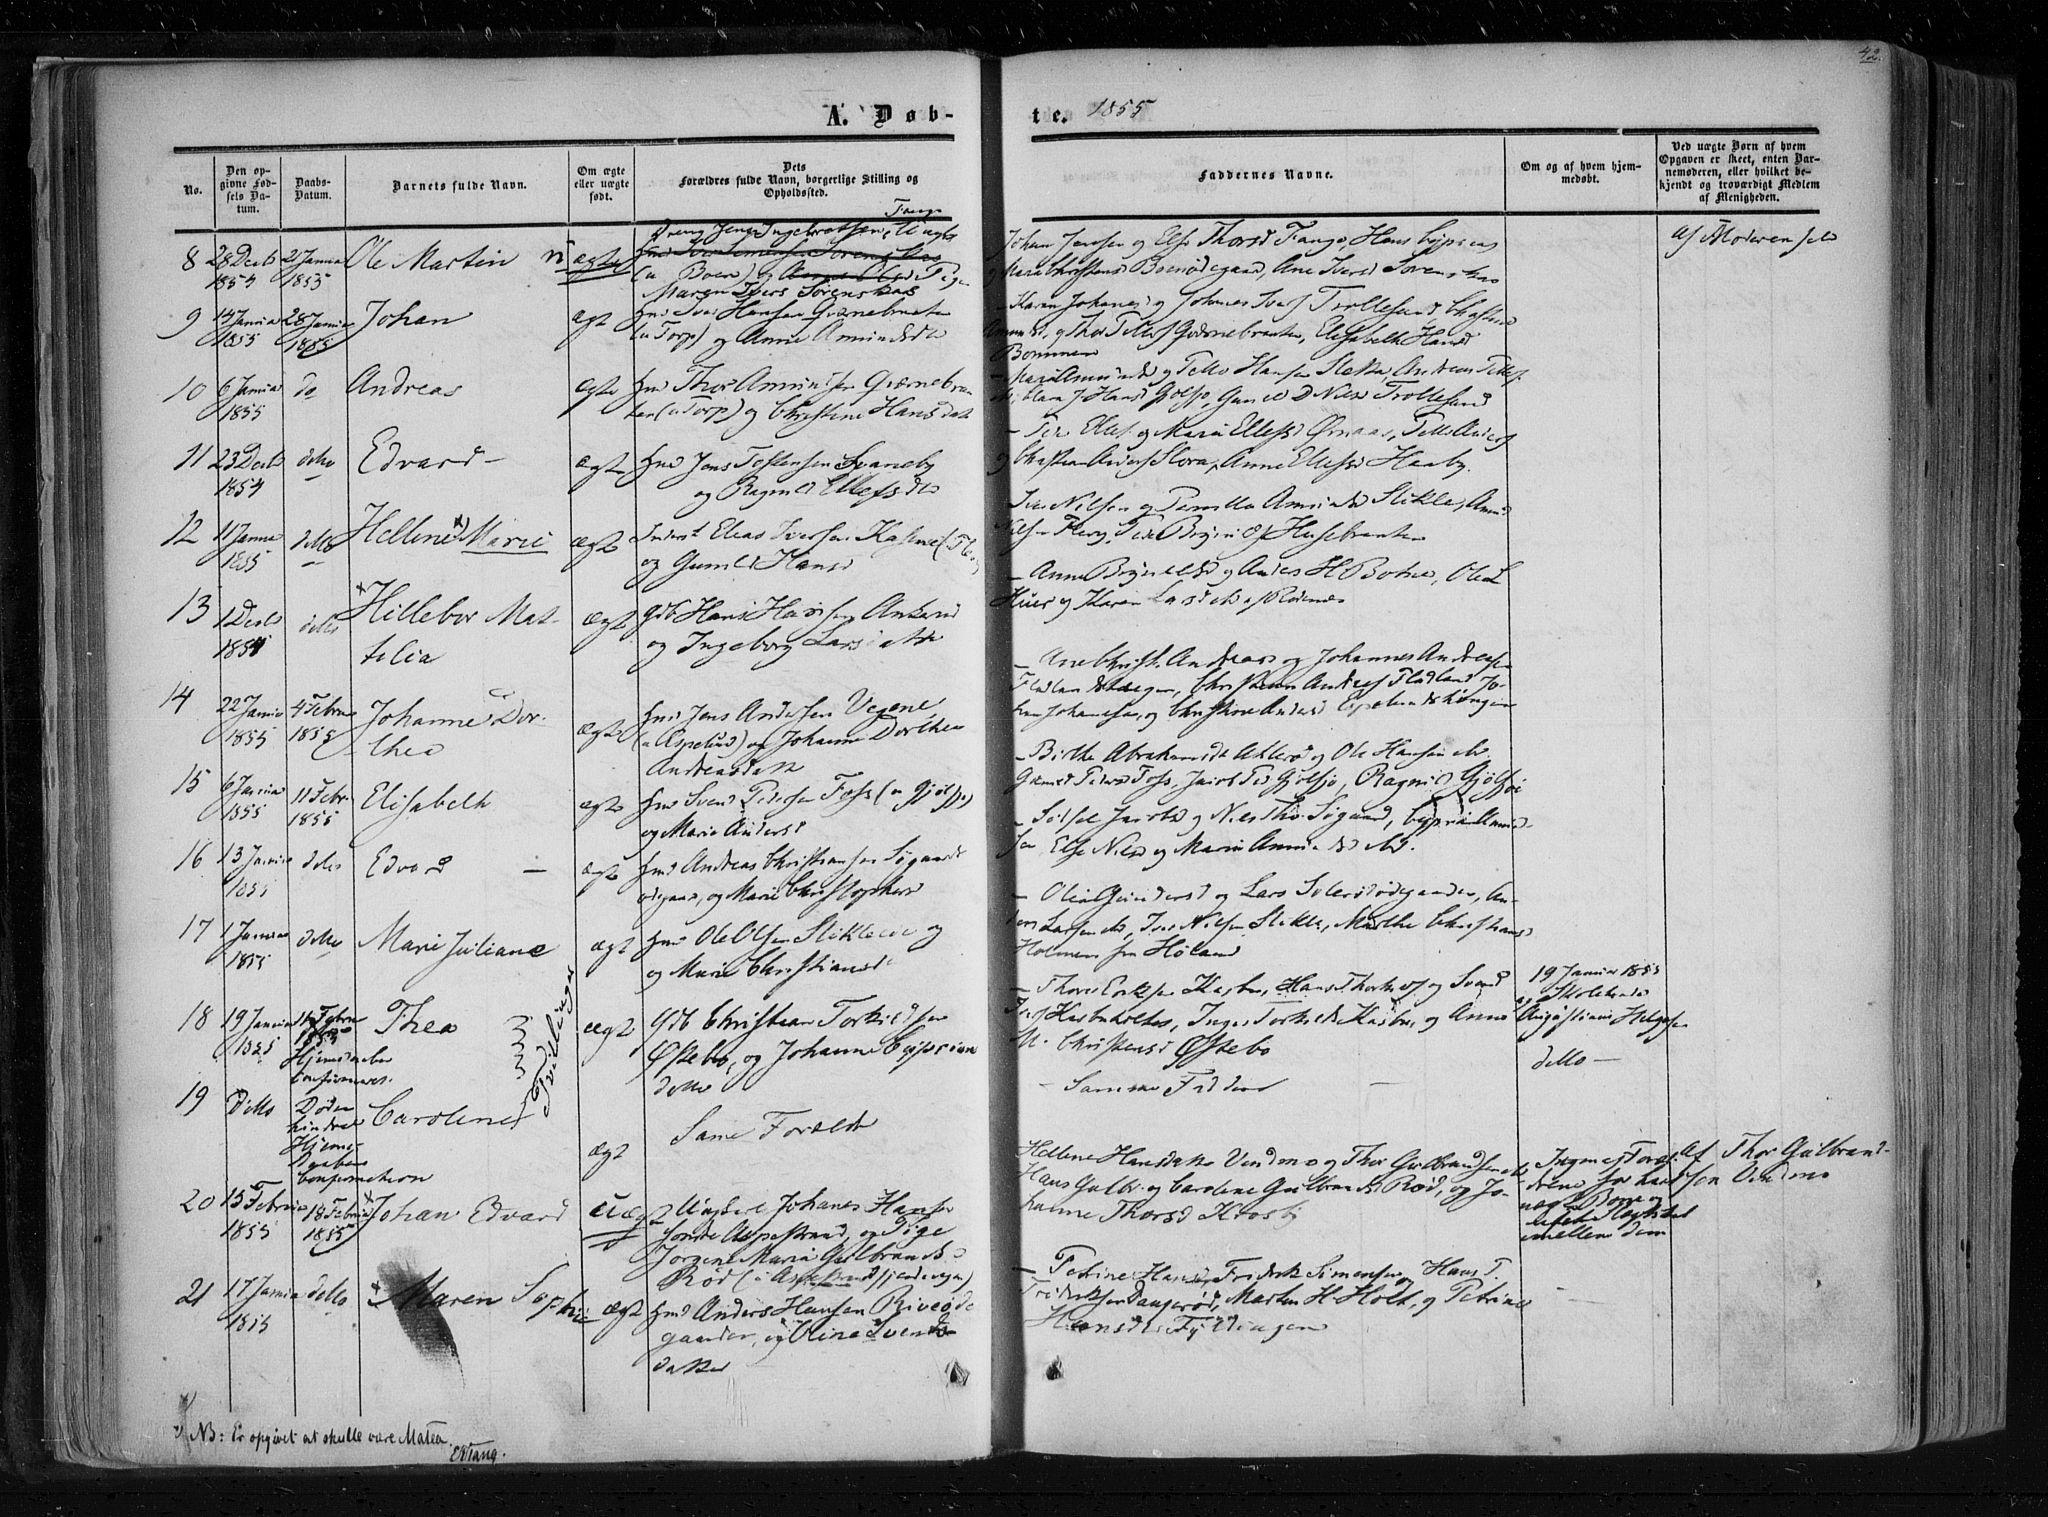 SAO, Aremark prestekontor Kirkebøker, F/Fc/L0003: Ministerialbok nr. III 3, 1850-1865, s. 42